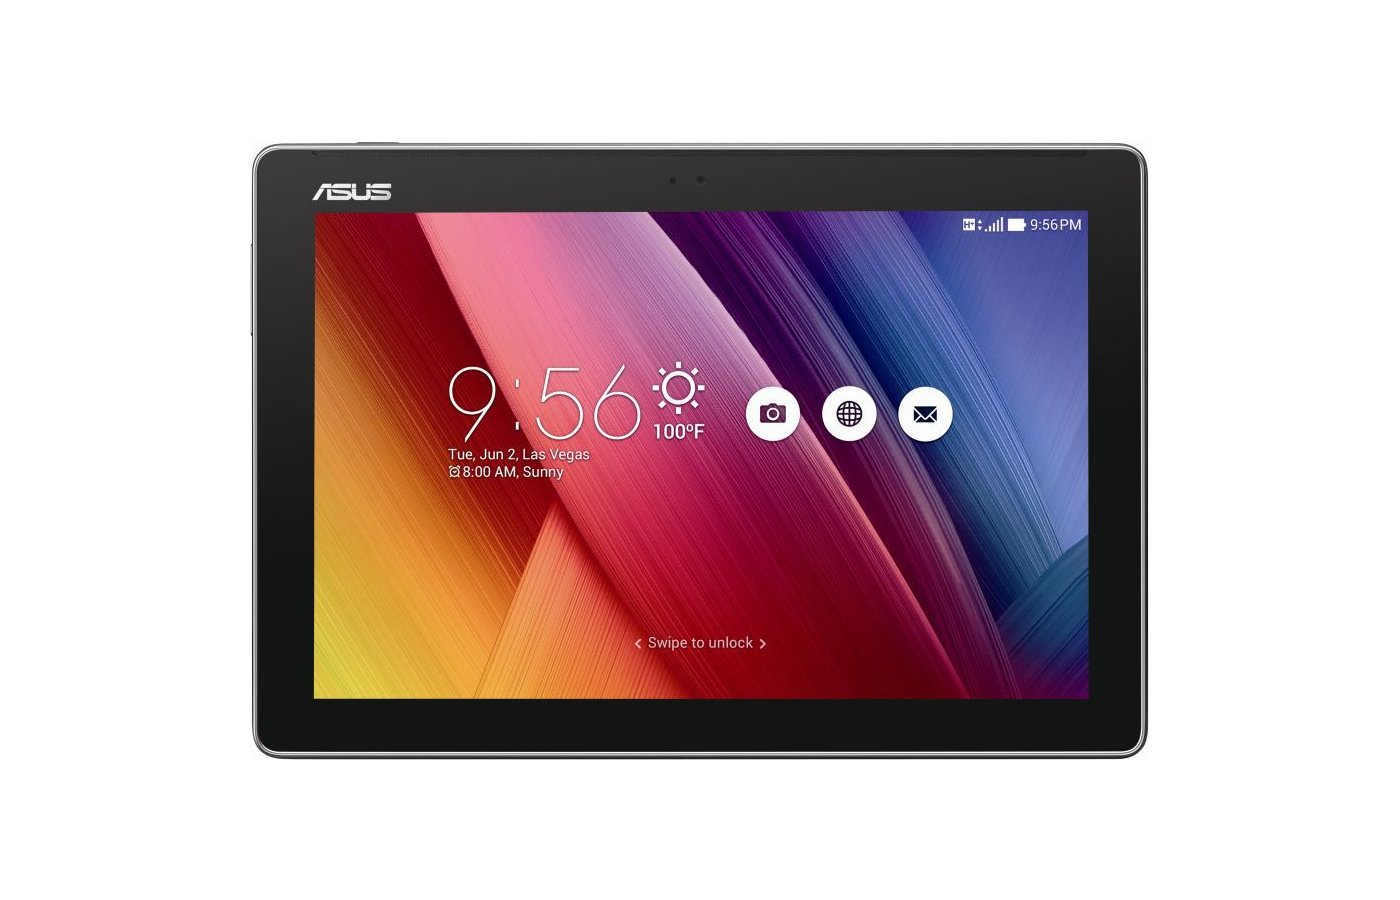 Планшет ASUS Z300CNG-6A009A (10.1) intel X3-C3230/16GB/3G/Dark Gray /90NP0214-M02040/